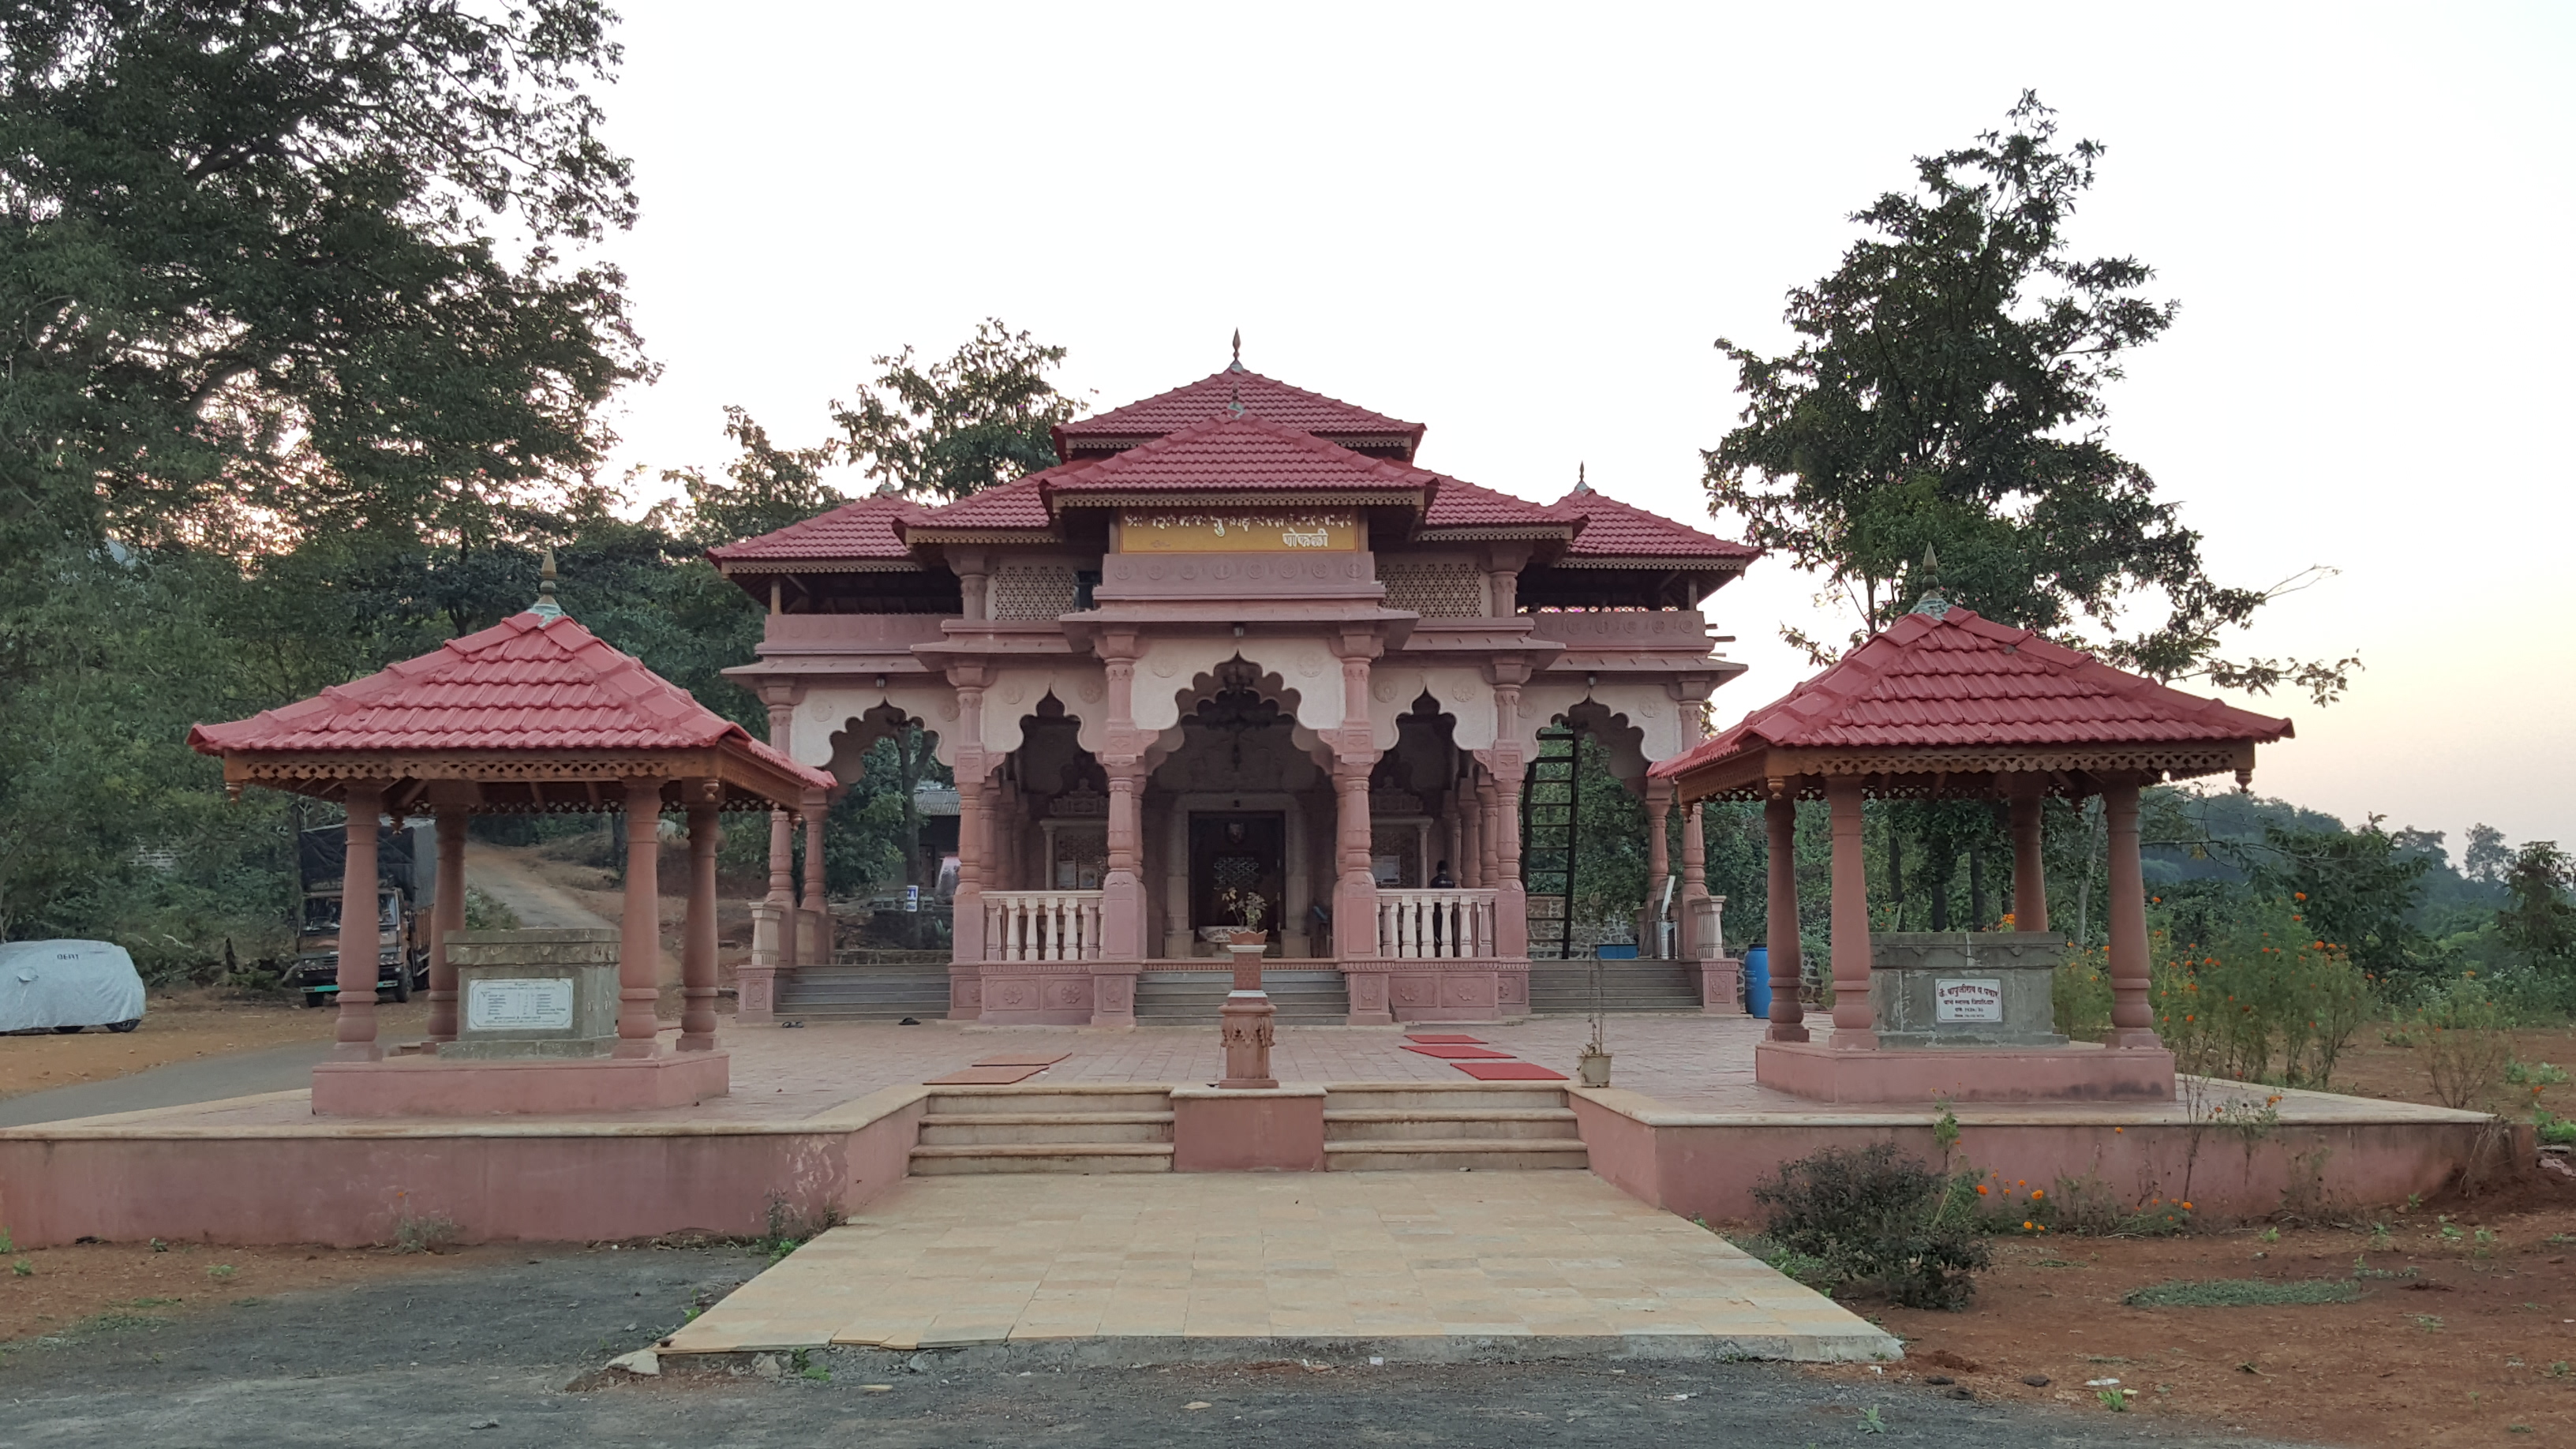 File:Mahakali temple jpg - Wikimedia Commons